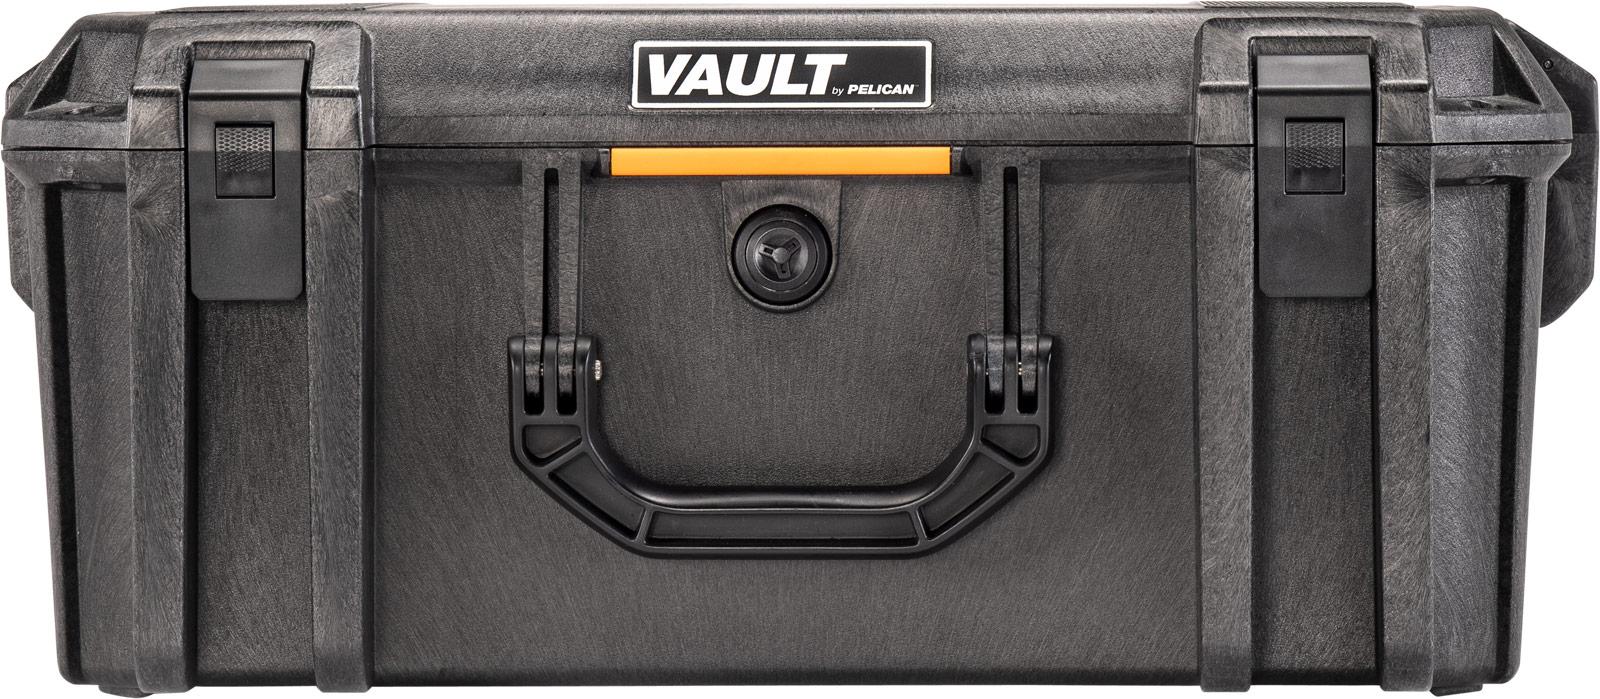 pelican vault v550 protective case